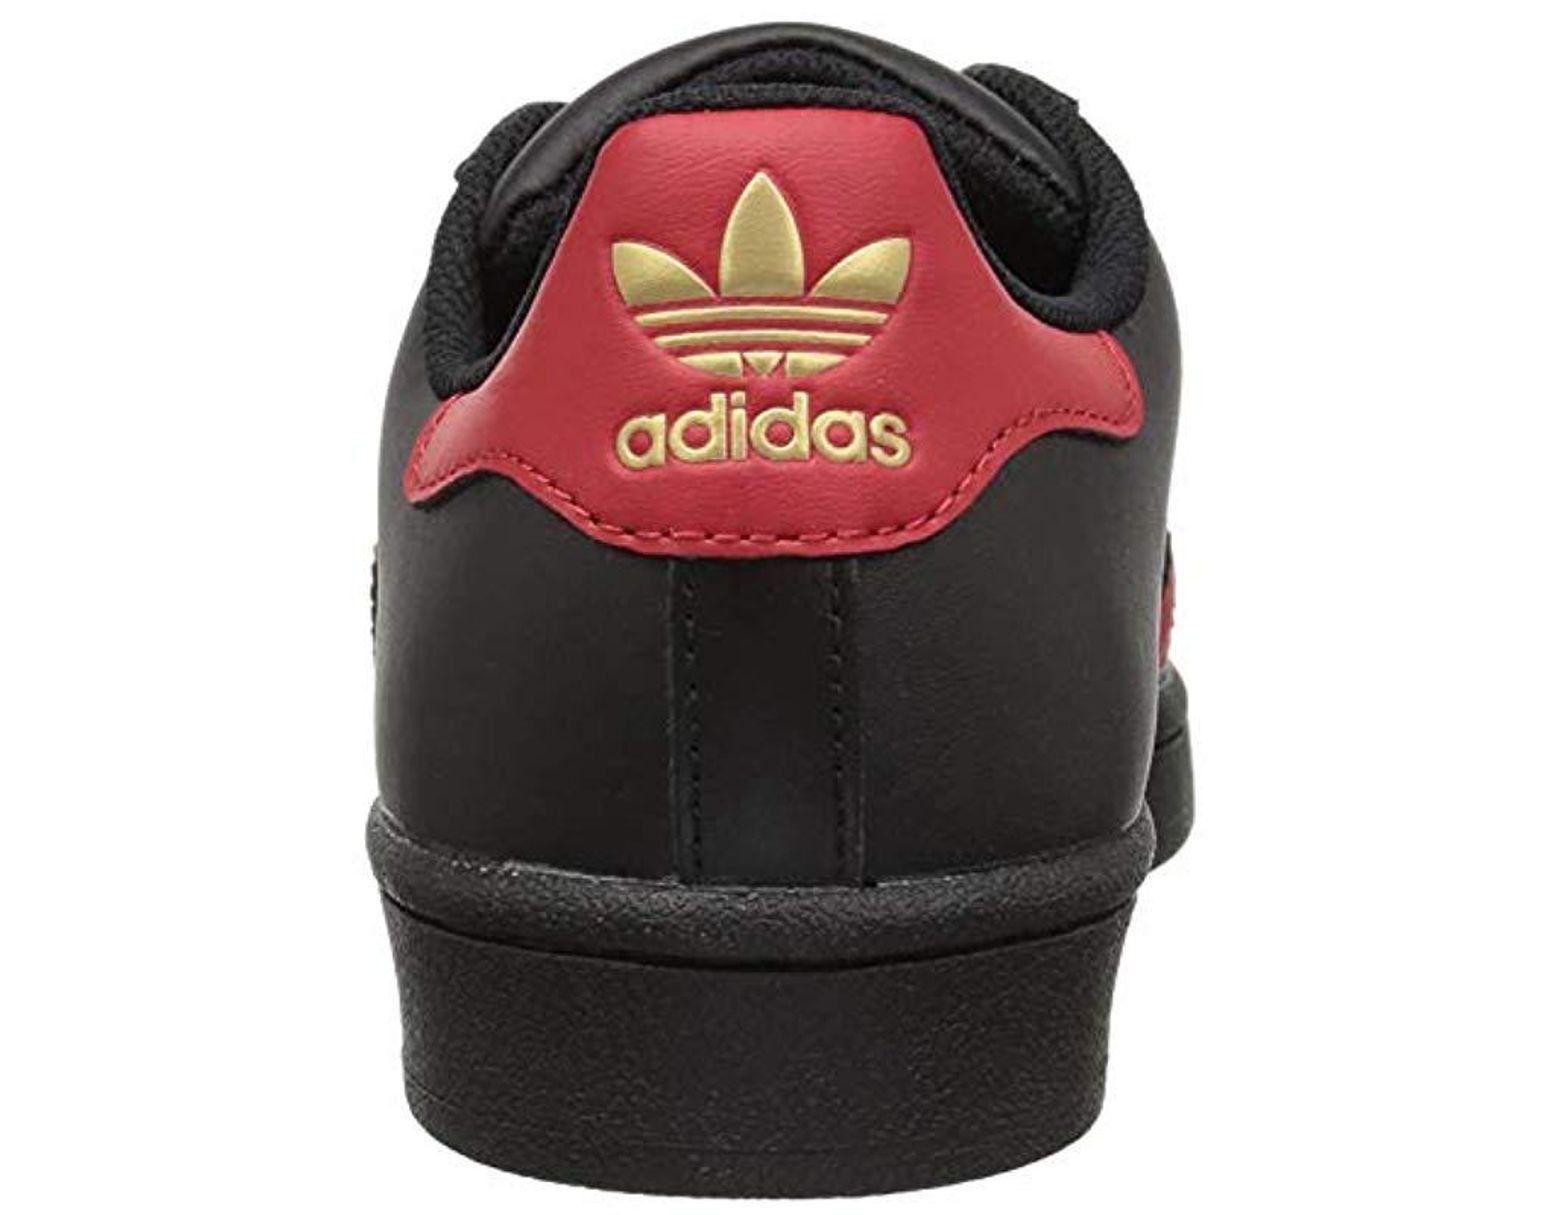 adidas (Adidas) SUPERSTAR J (superstar) sneakers shoes CBLACKSCARLEGOLDMT (black red) S80695